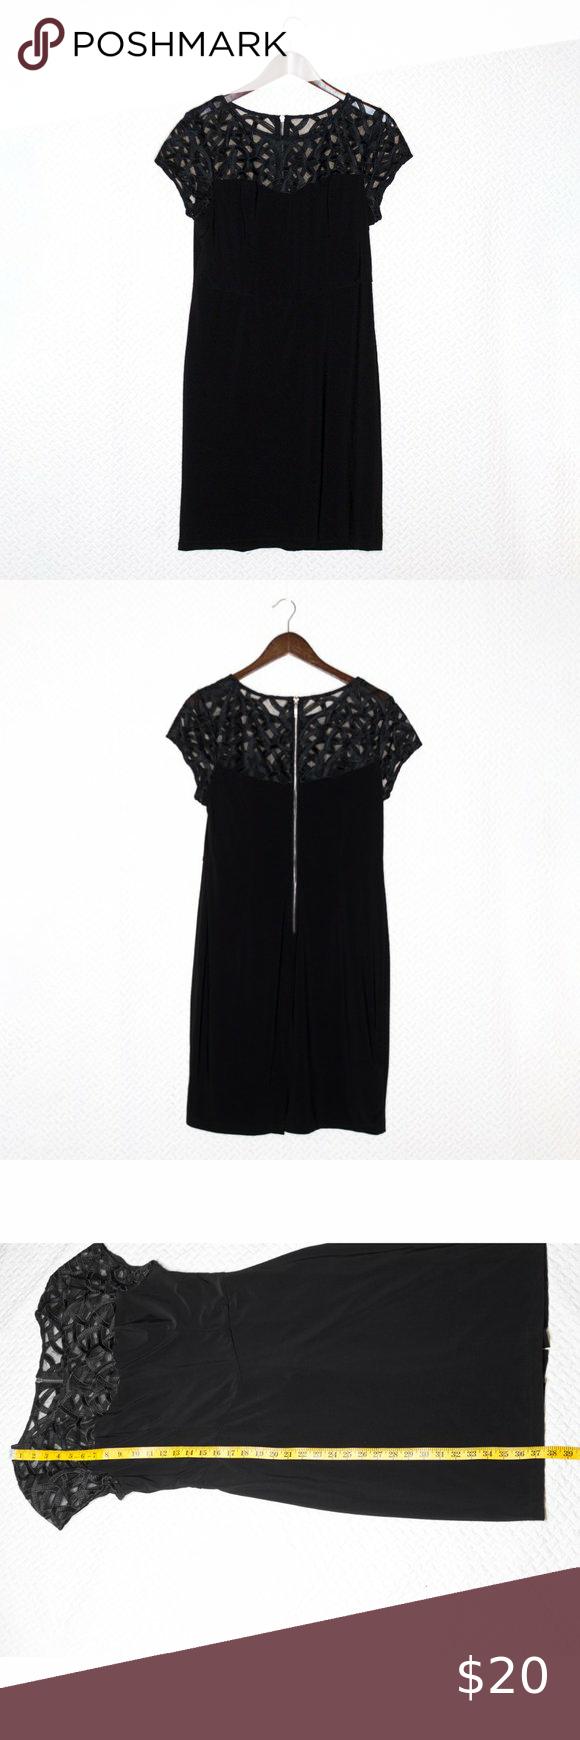 Db Established 1962 Lbd With Sheer Little Black Dress Black Dress Fashion [ 1740 x 580 Pixel ]